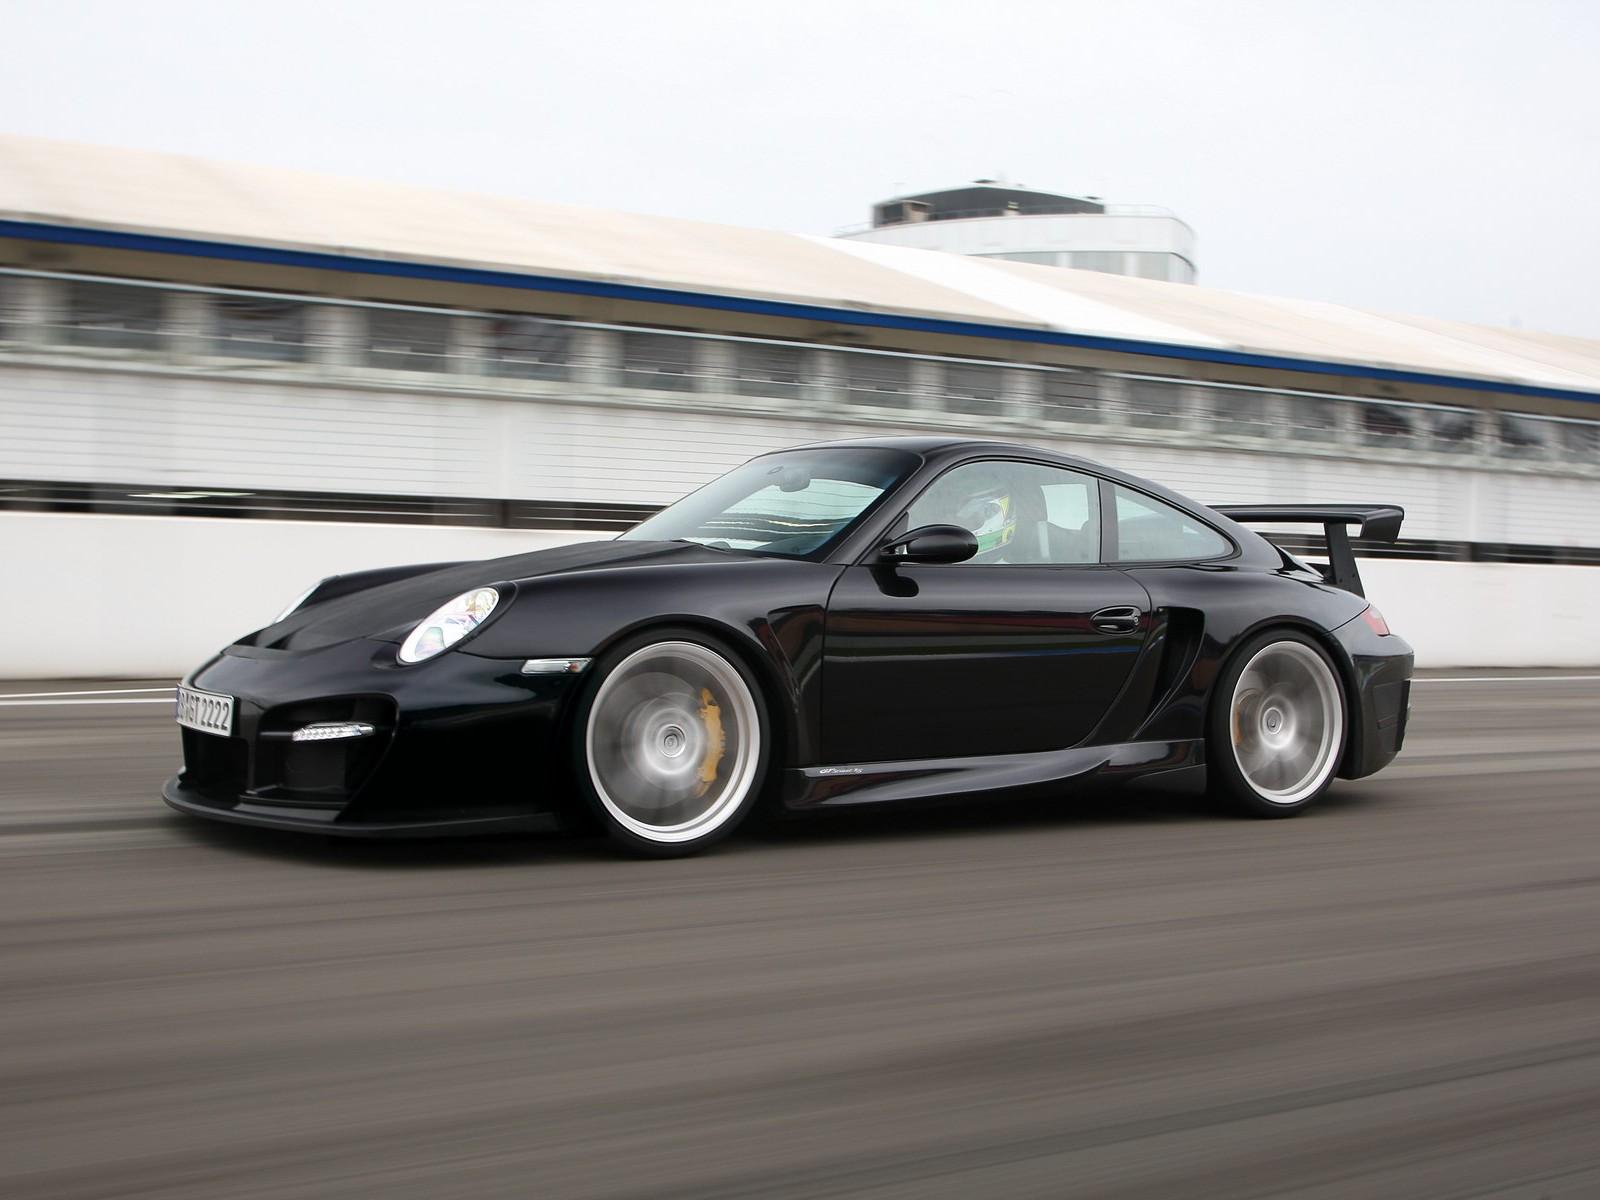 porsche-911-gt2-997-05 Wonderful Porsche 911 Gt2 Wheel for Sale Cars Trend